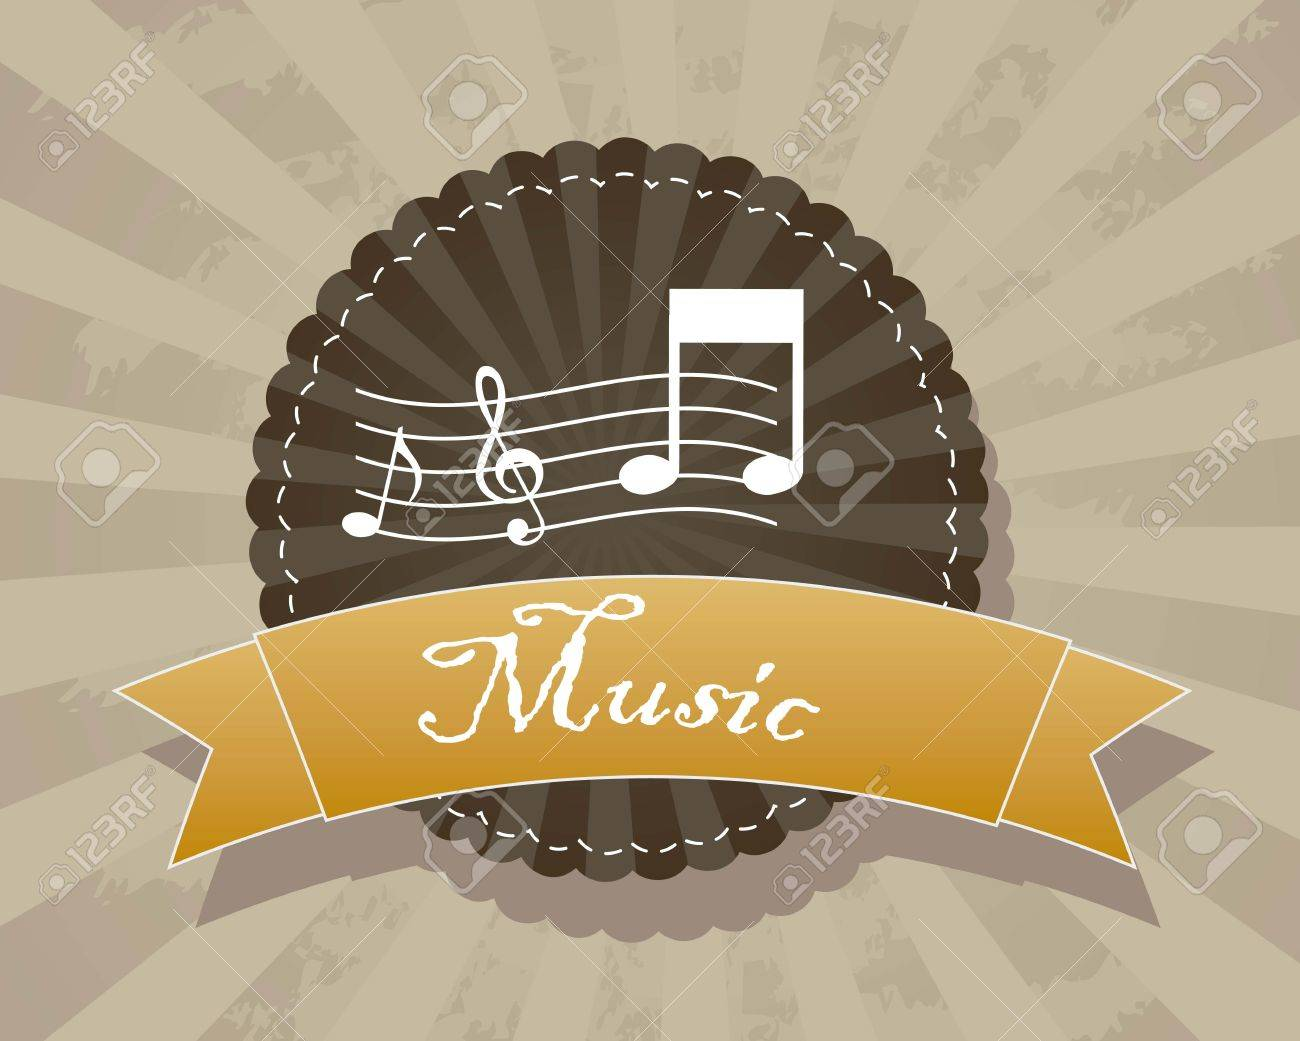 music label over grunge background. vector illustration Stock Vector - 15136067